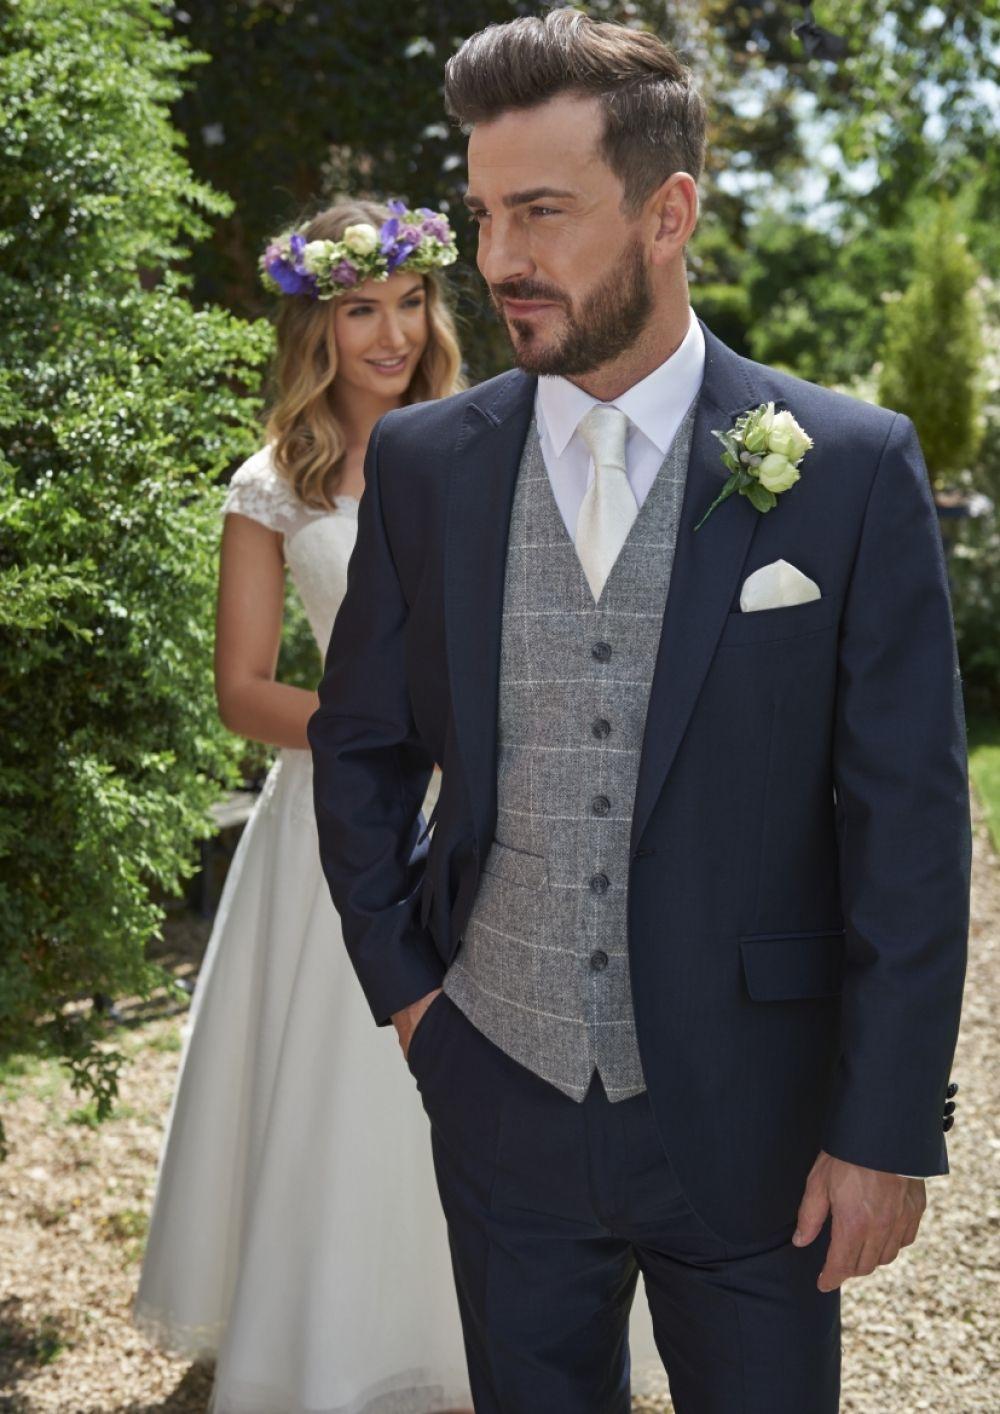 d4f6751eecfe Uppington - Lounge Suits - Wedding Suits